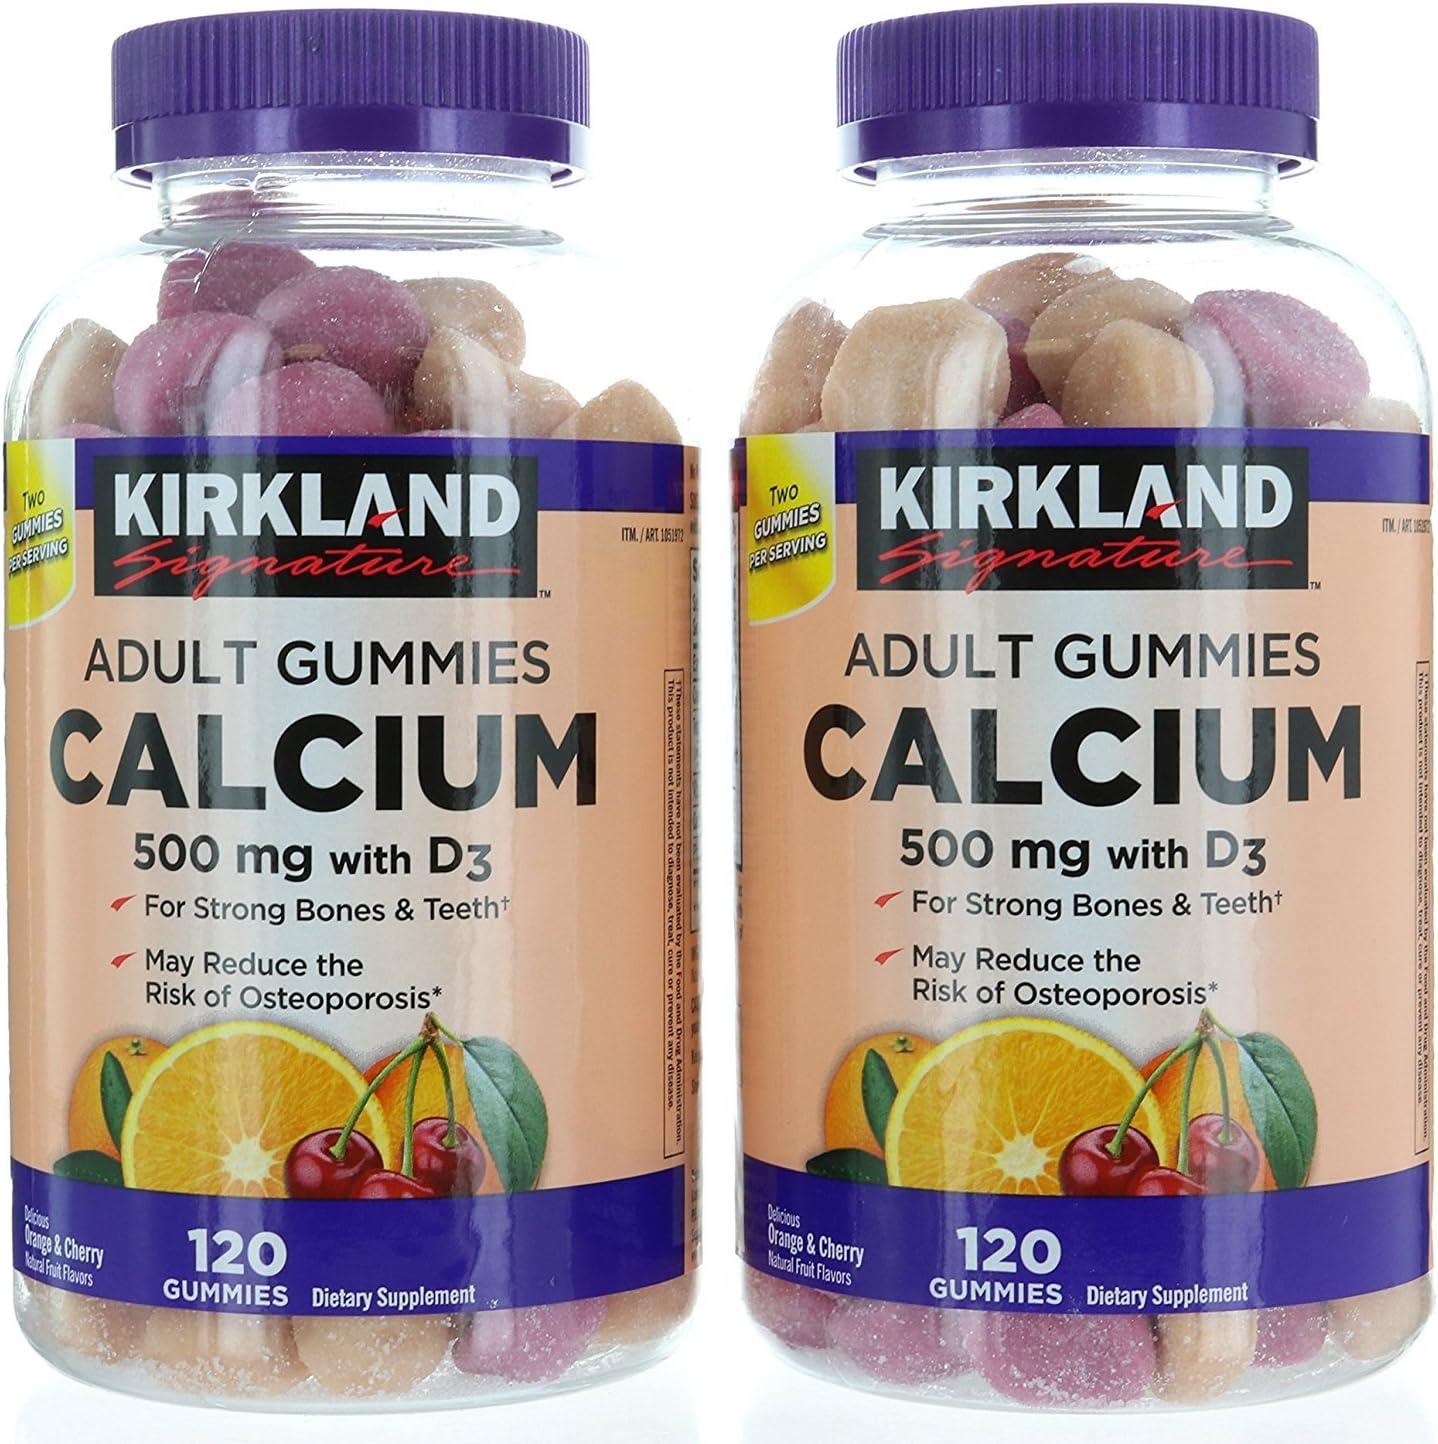 Amazon Com Kirkland Signature Chewable Calcium With Vitamin D3 Adult Gummies 120 Ct X 2 Bottles Health Personal Care